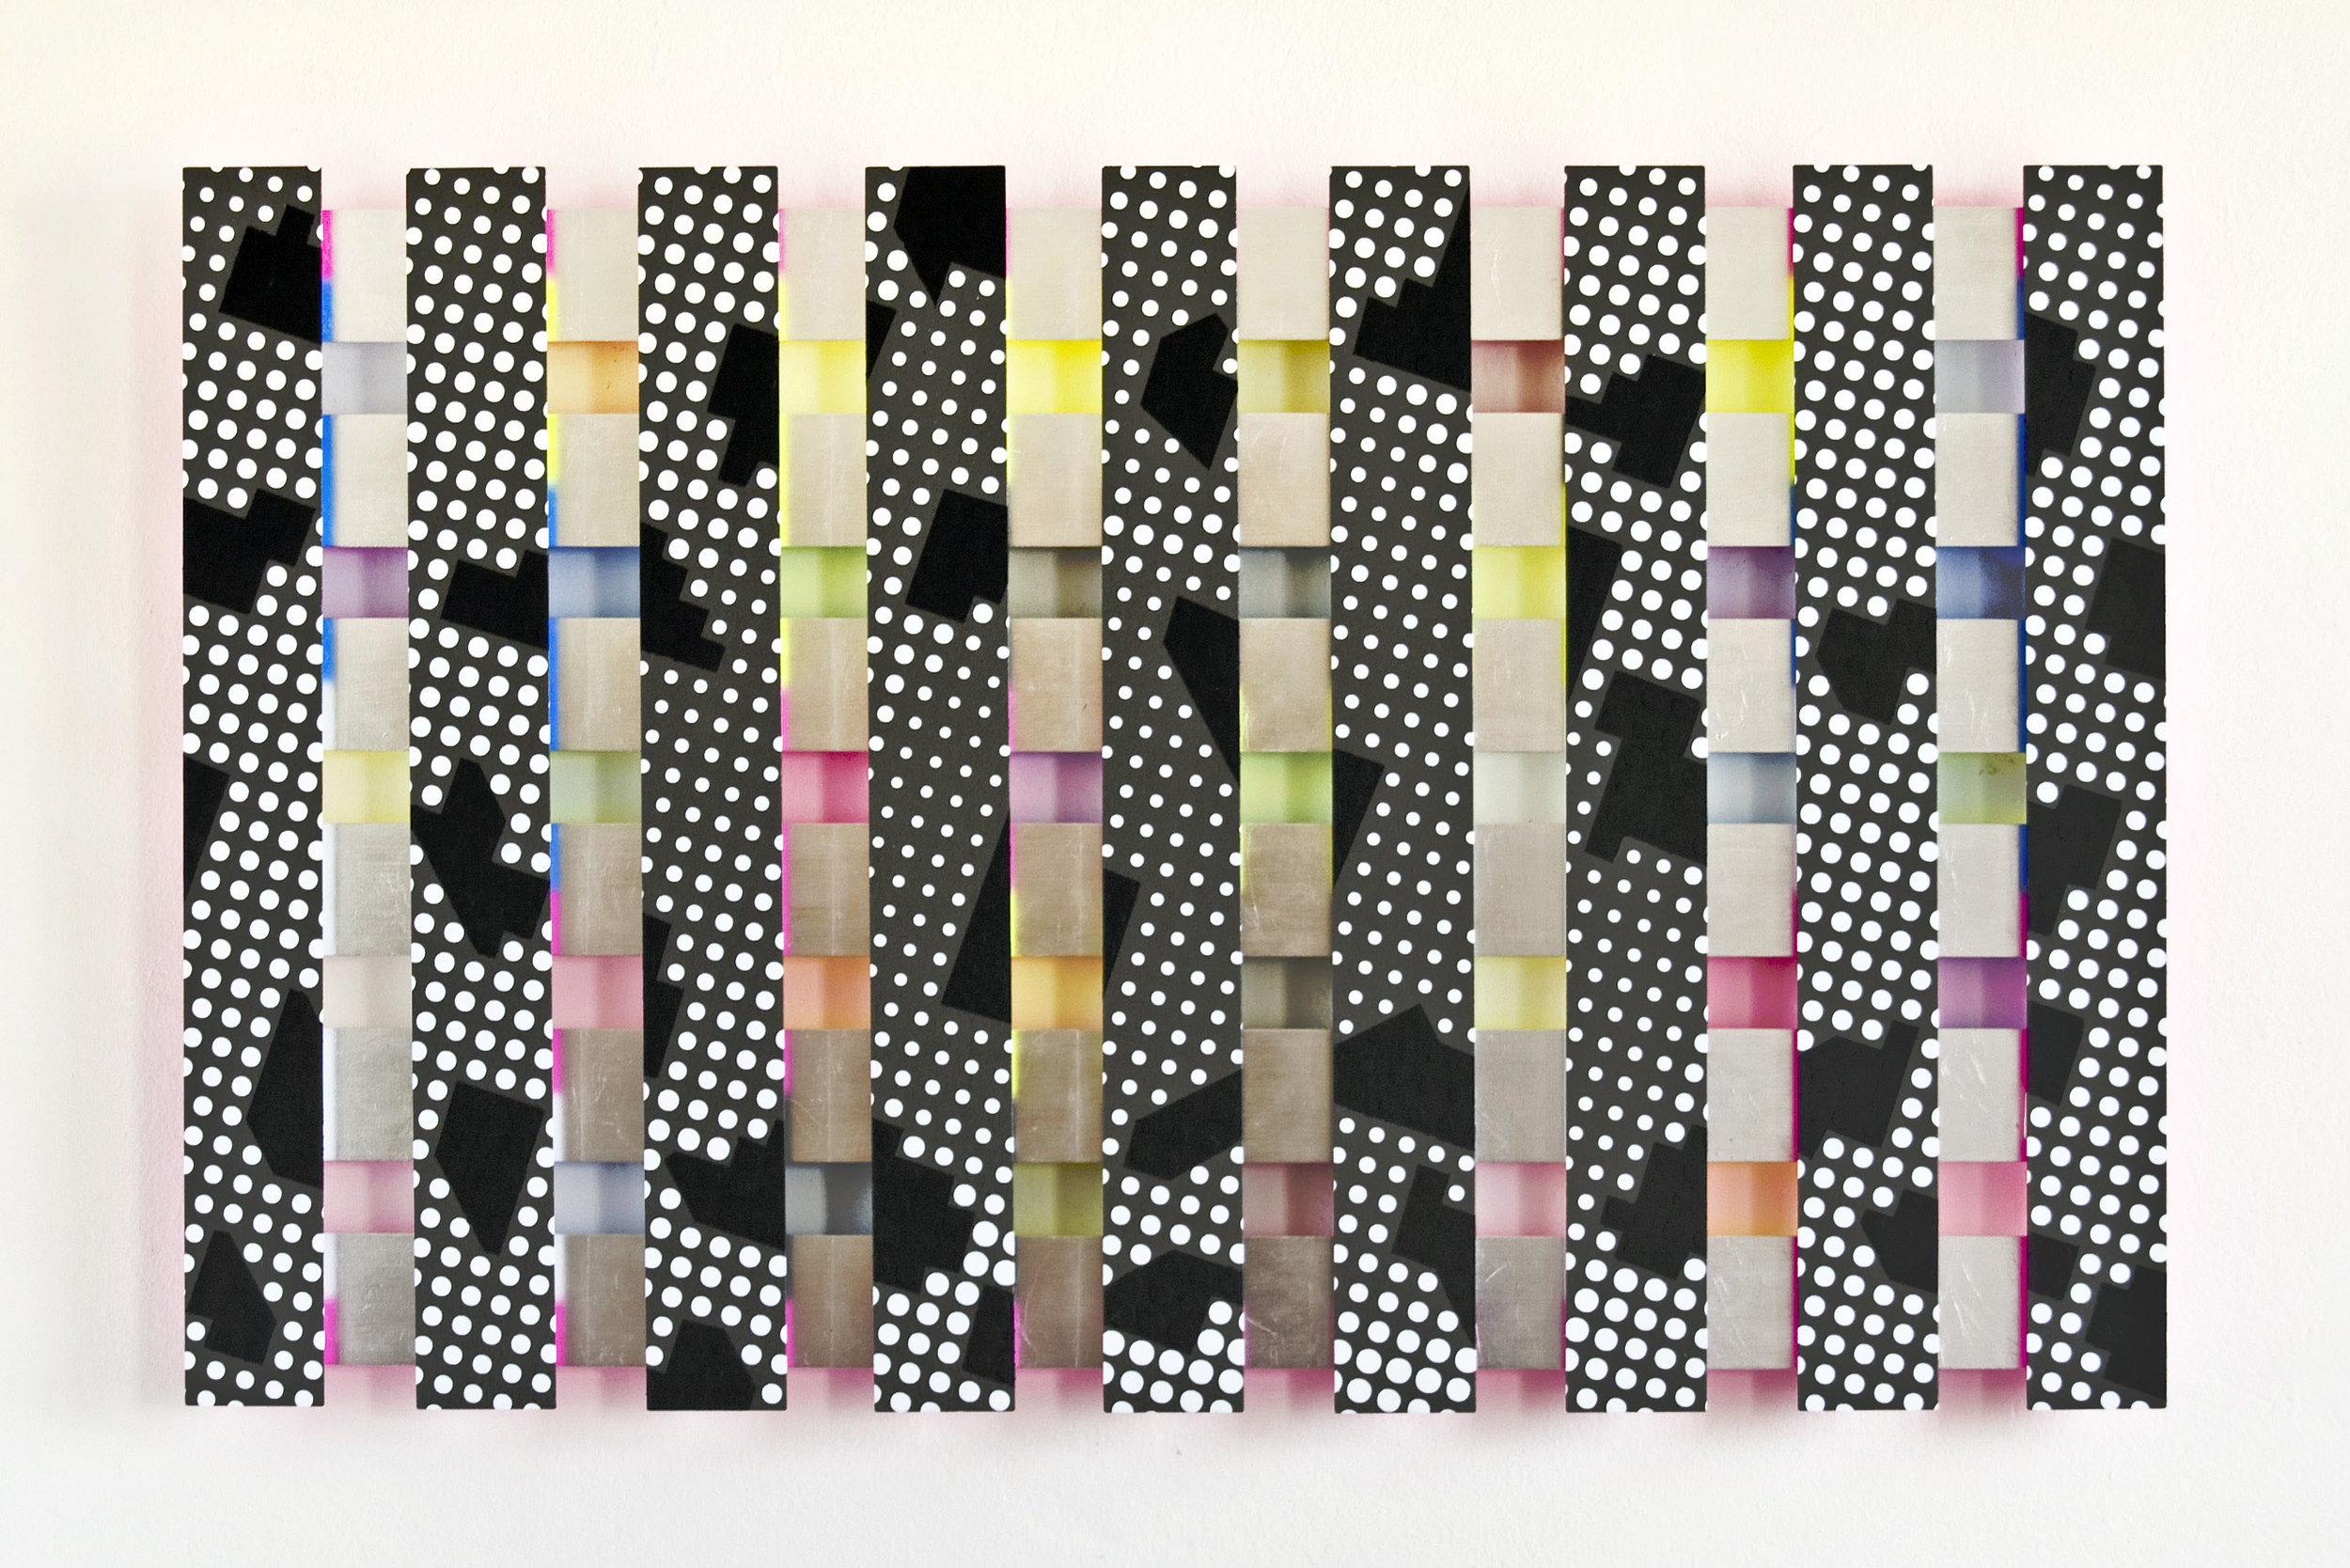 3g akril, les, 79 x 125 cm, 2010.jpg